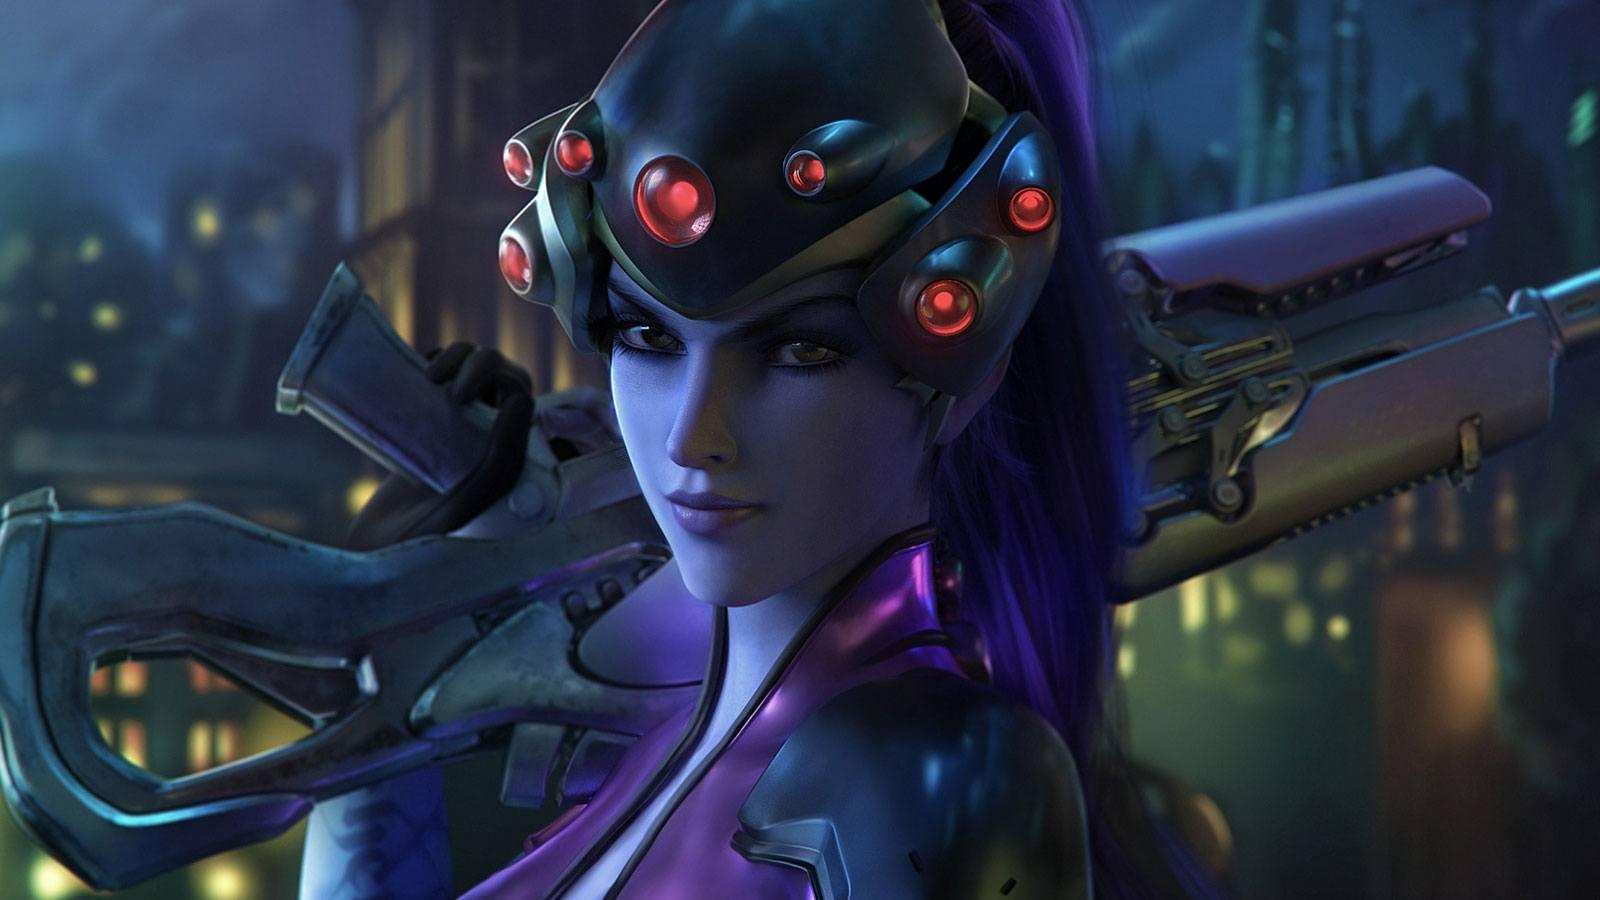 Fatale Overwatch jeune joueuse réalise un headshot